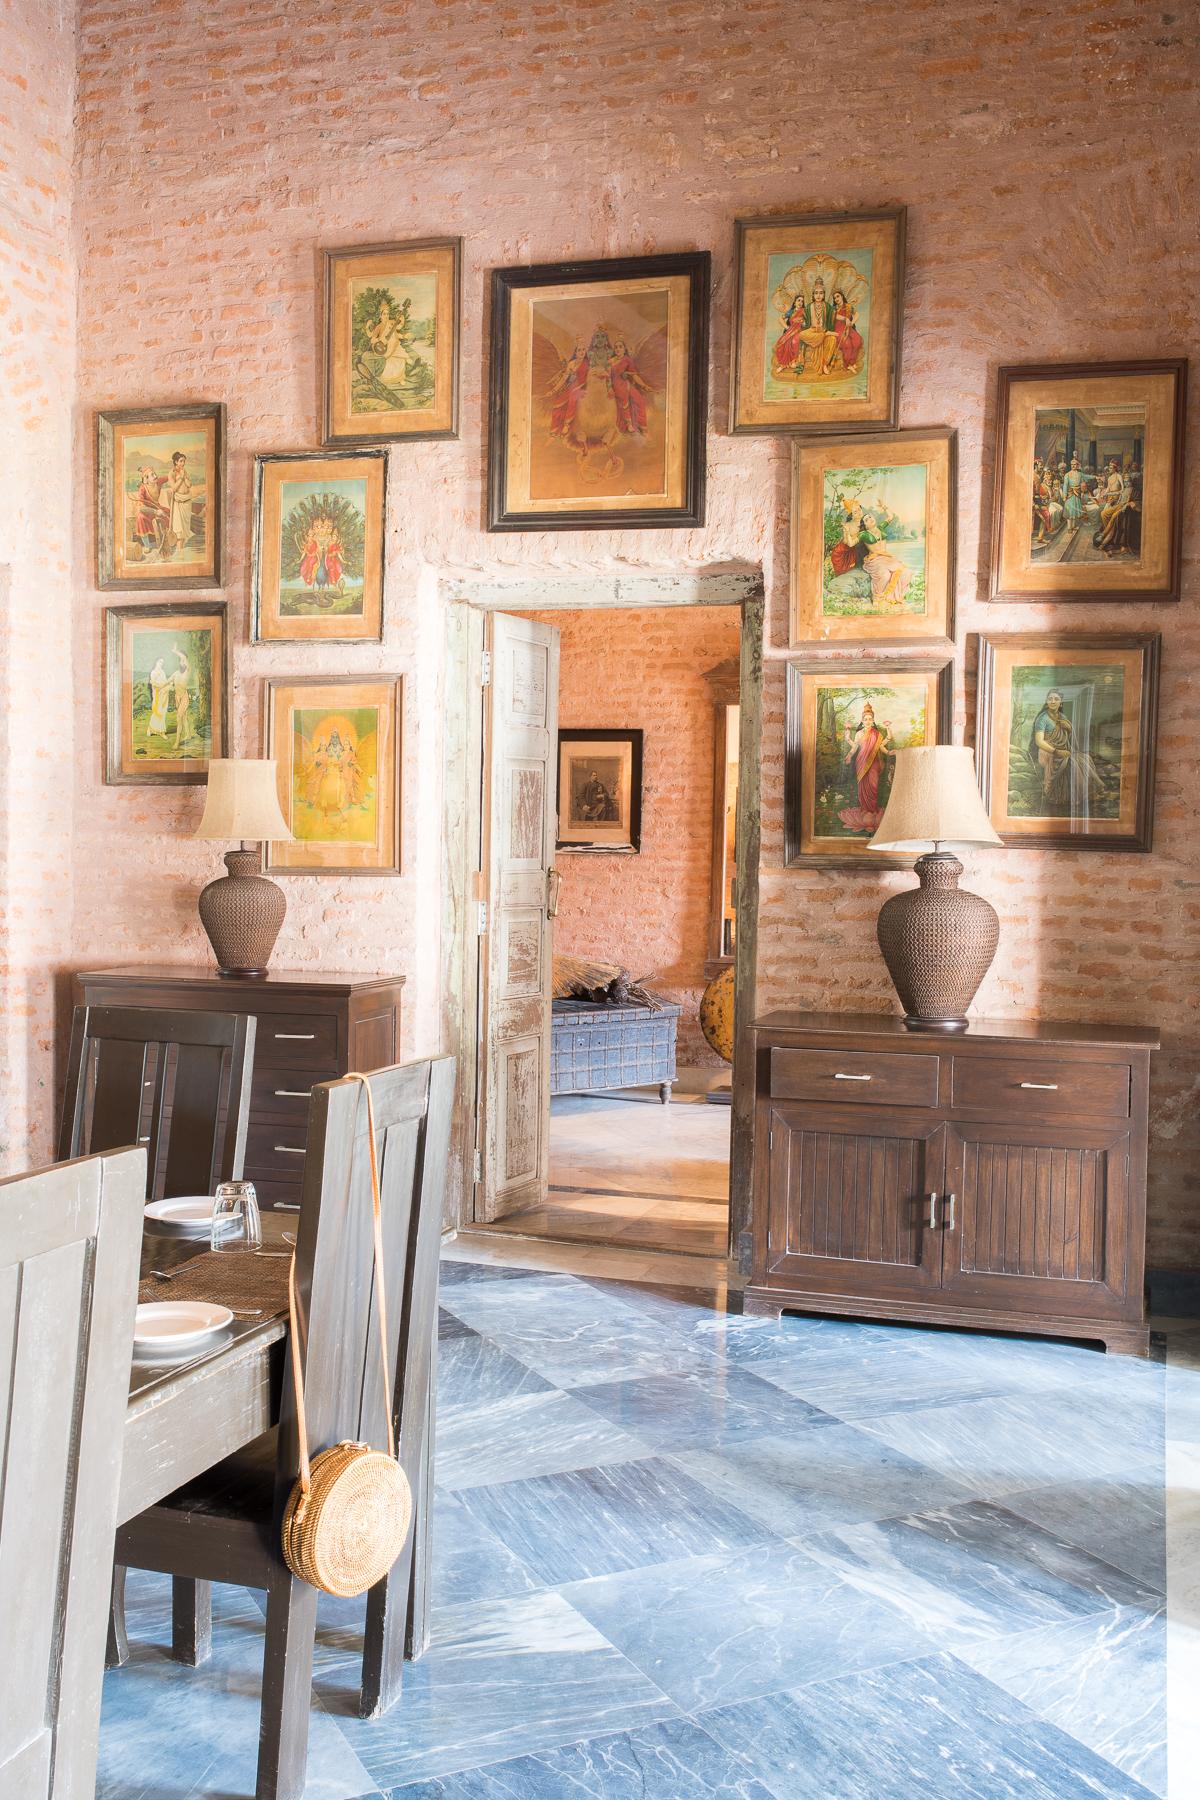 Stacie Flinner The Rajbari Bawali Heritage Hotel Calcutta-111.jpg